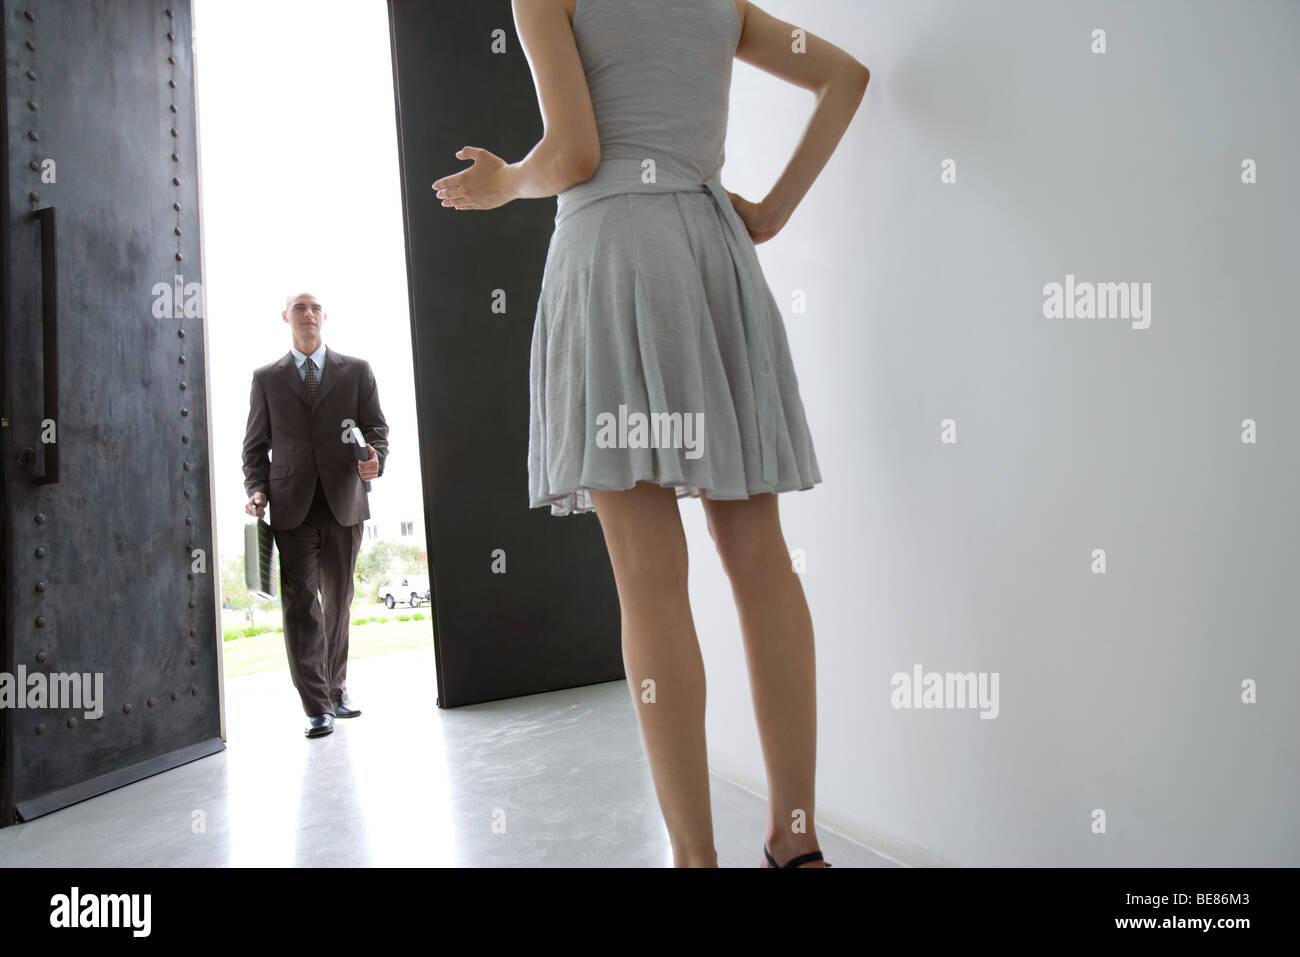 Man Walking through doorway, woman waiting with hand on hip en premier plan Banque D'Images